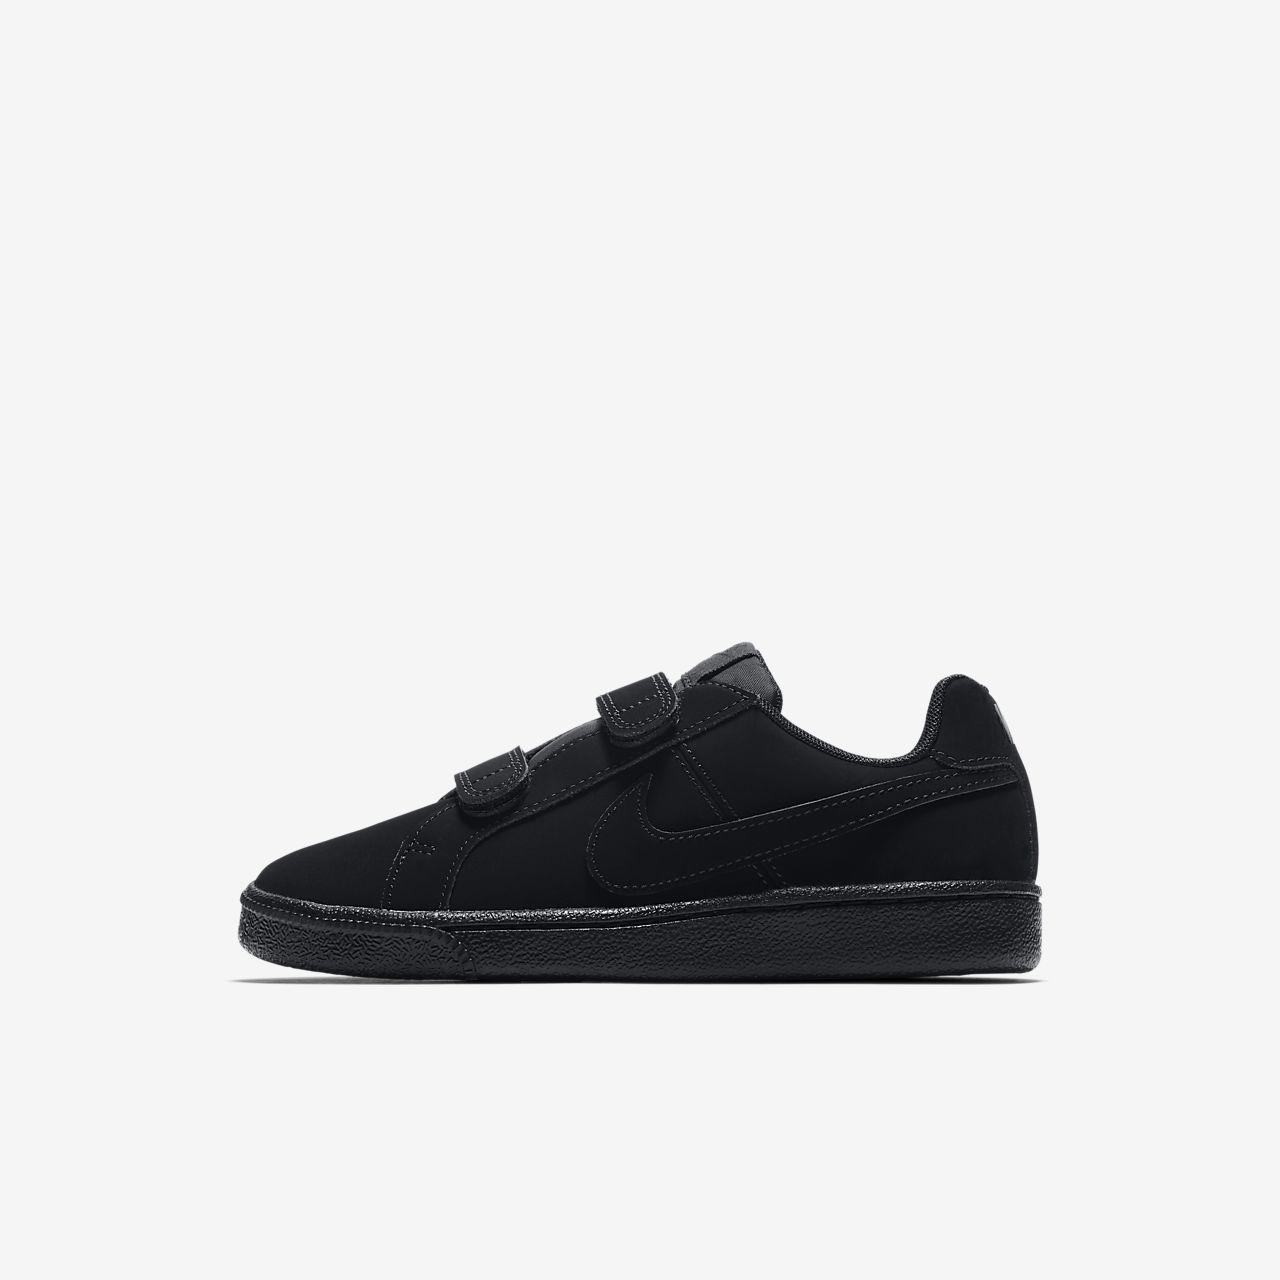 NikeCourt Schuh für jüngere Kinder Royale cALq53Rj4